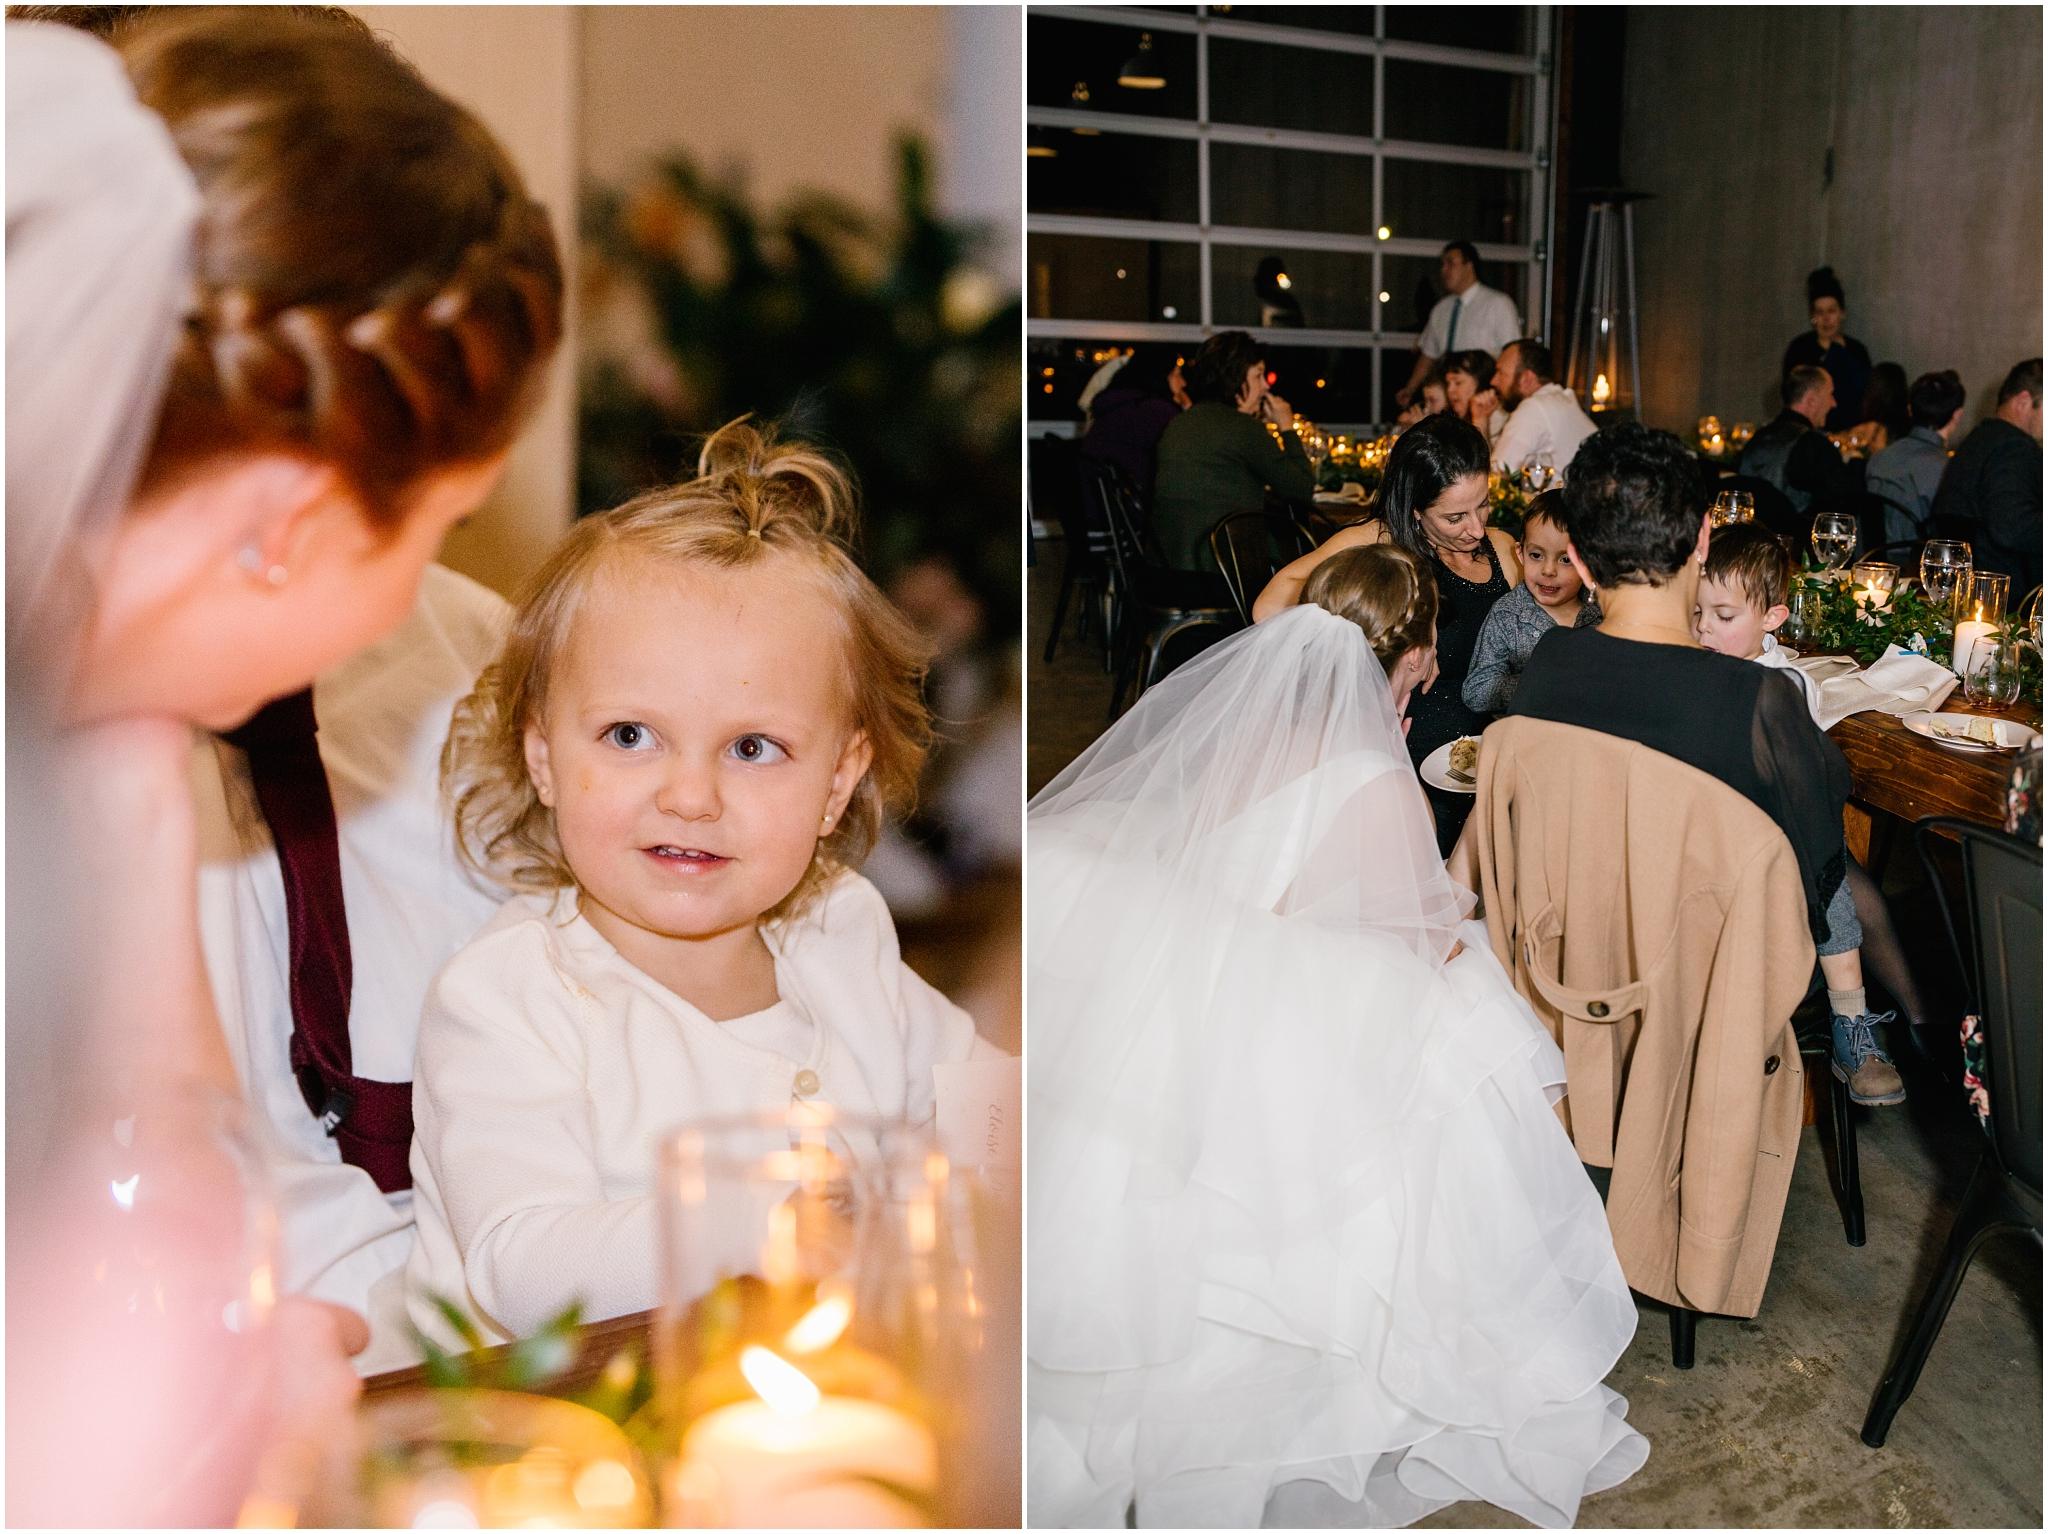 CN-Wedding-407_Lizzie-B-Imagery-Utah-Wedding-Photographer-Blessed-Sacrament-Catholic-Church-Sandy-Utah-The-Blended-Table-Salt-Lake-City.jpg